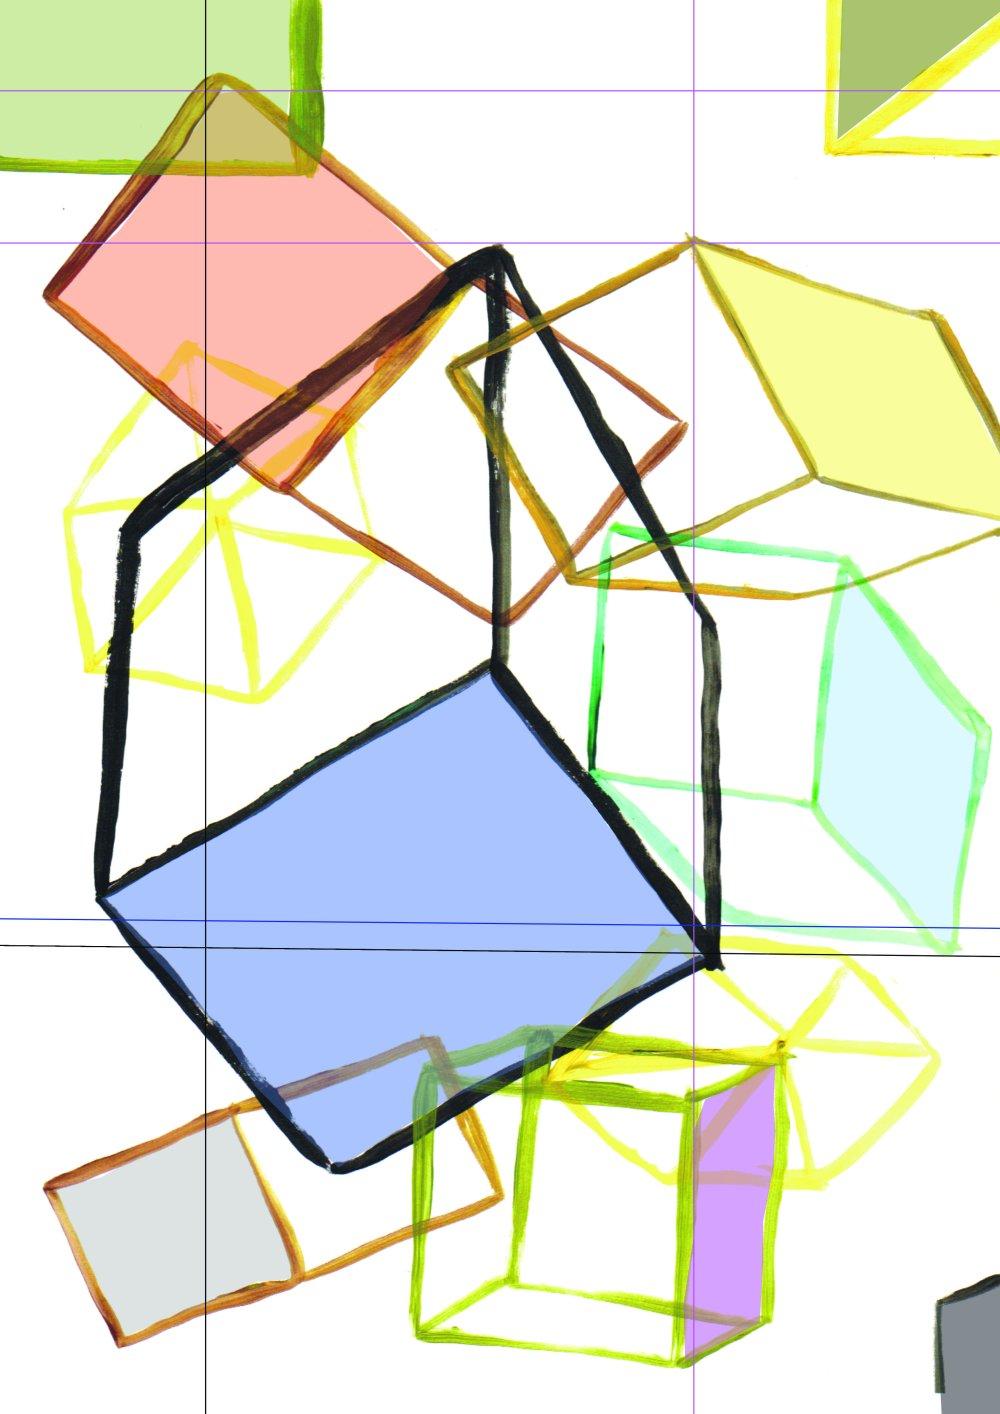 cubed-solitude-grid